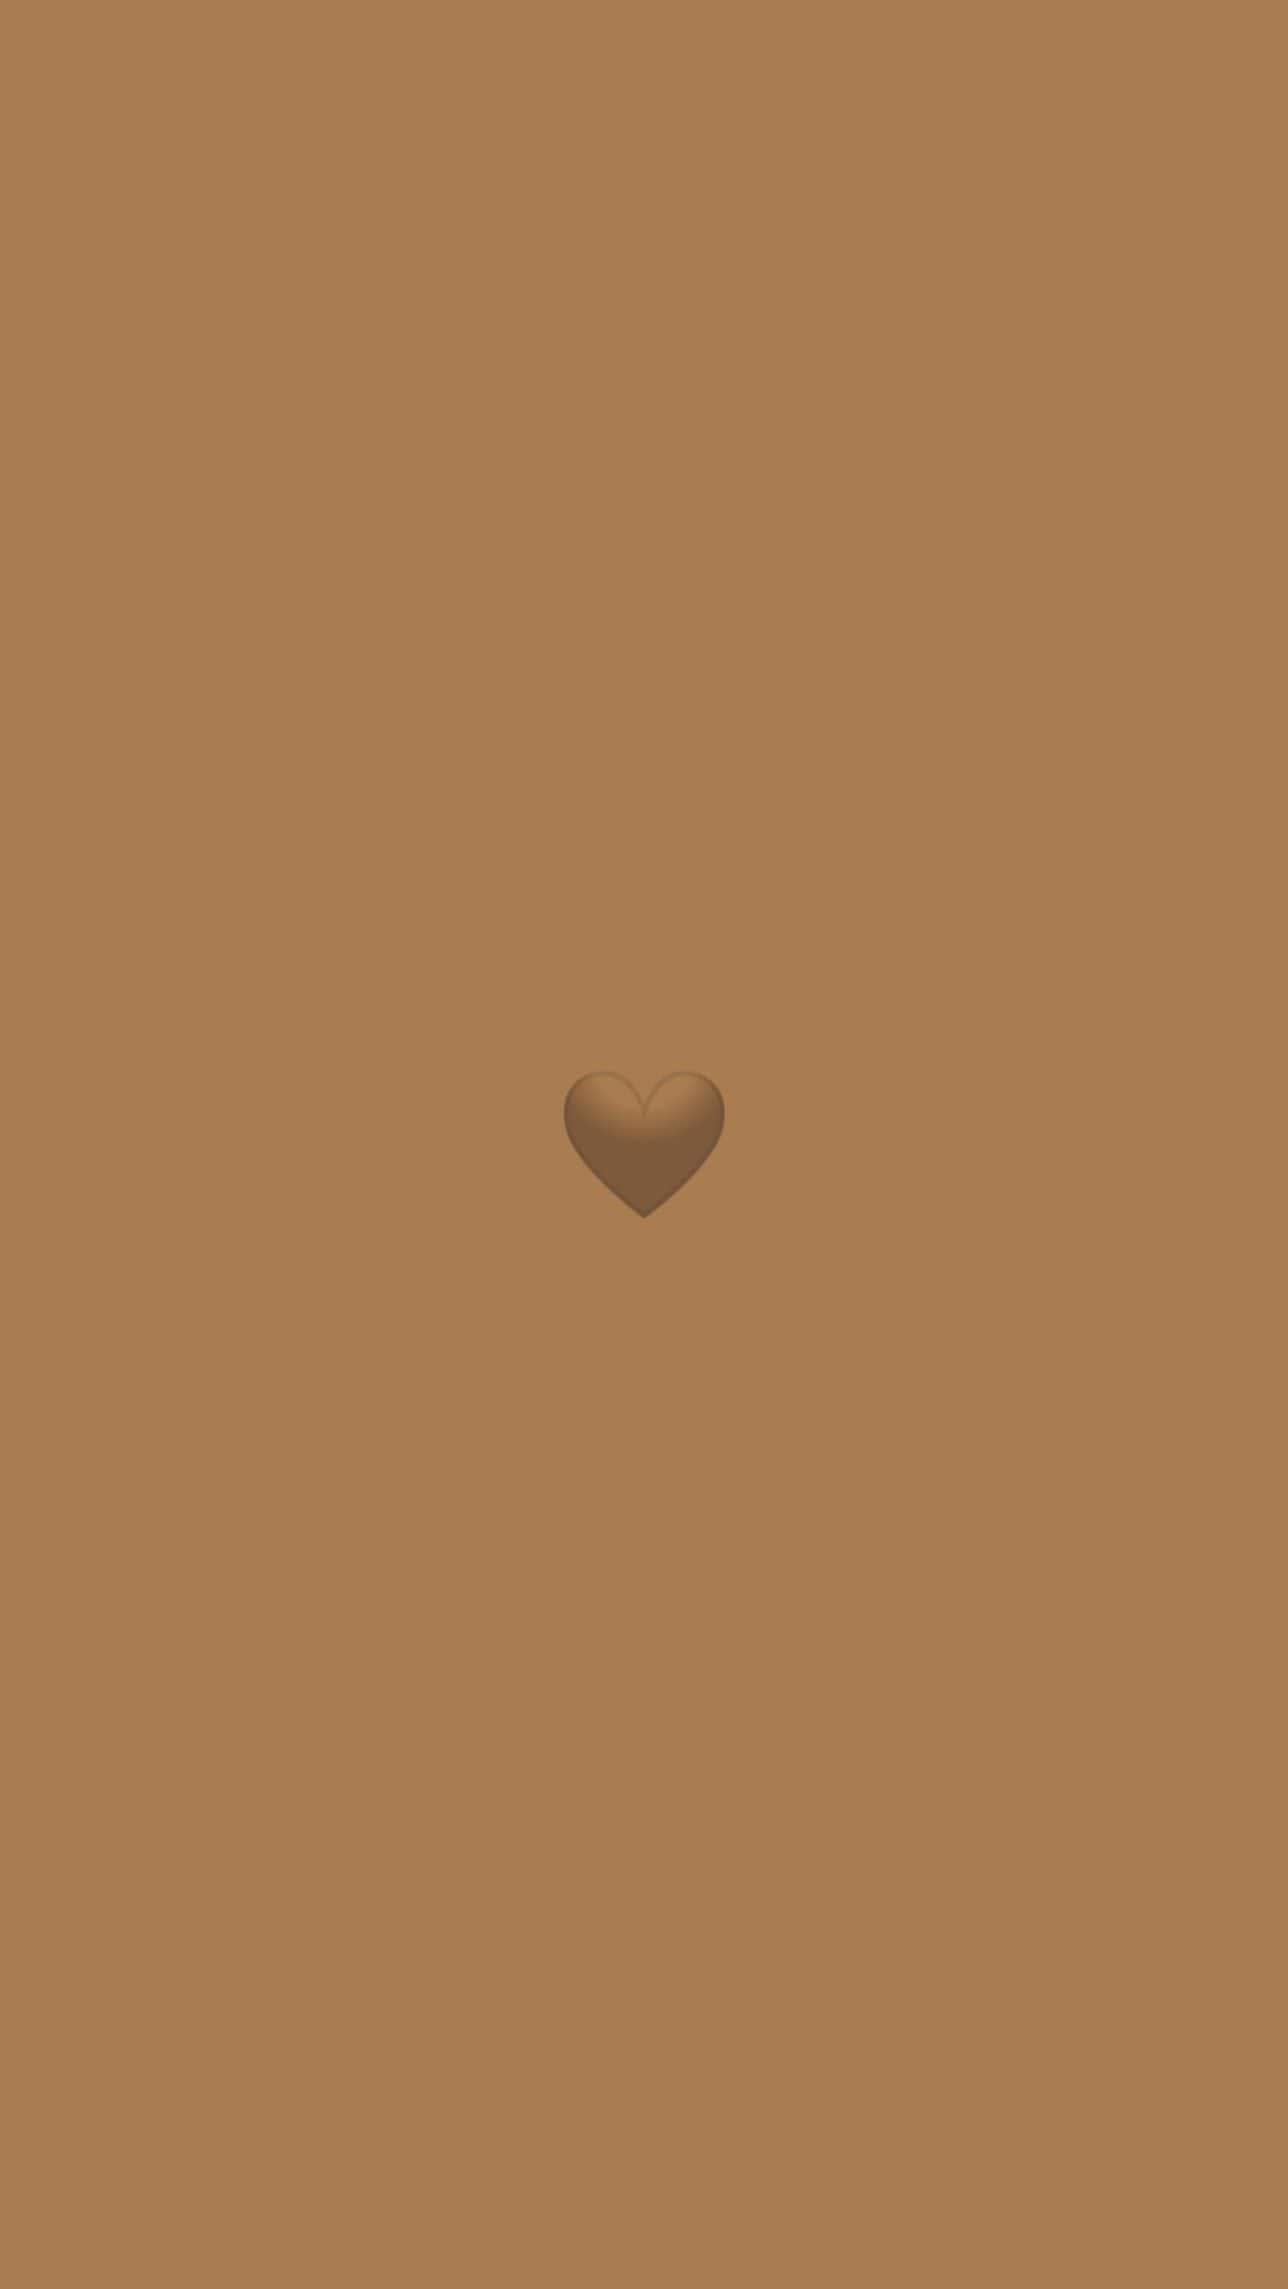 Brown Heart Wallpaper - NawPic